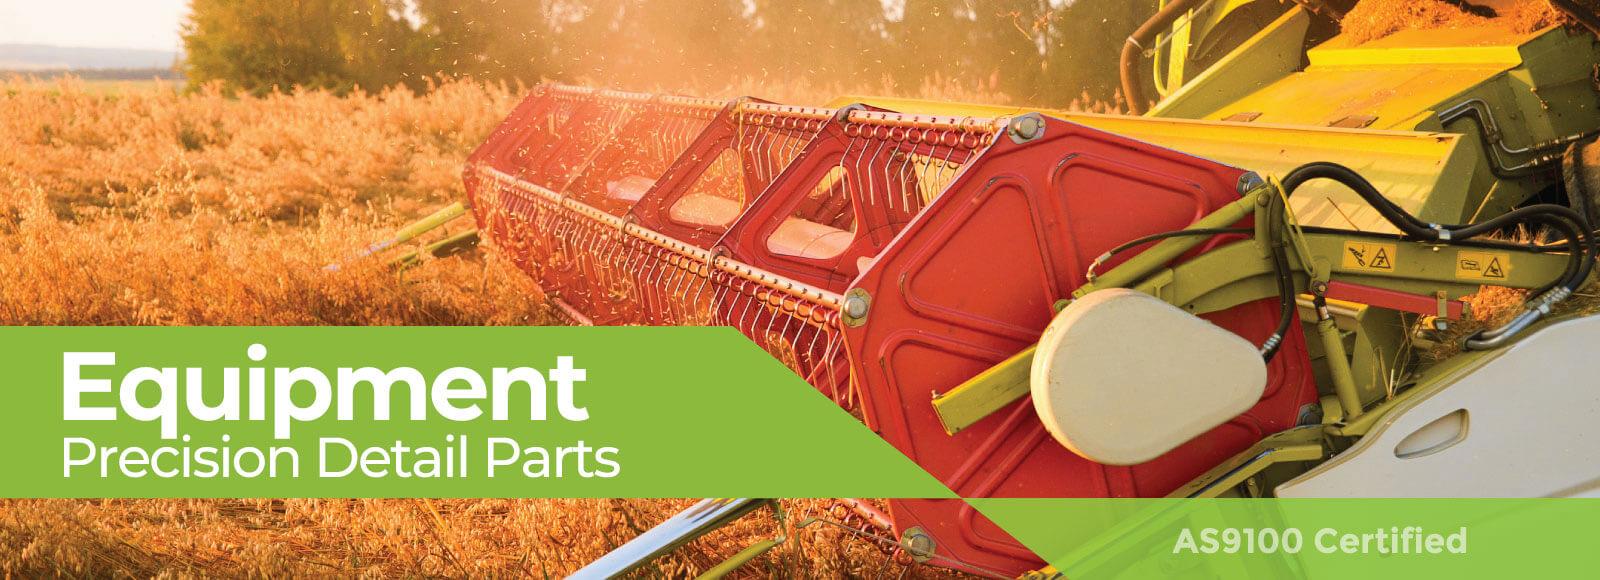 Equipment Precision Detail Parts